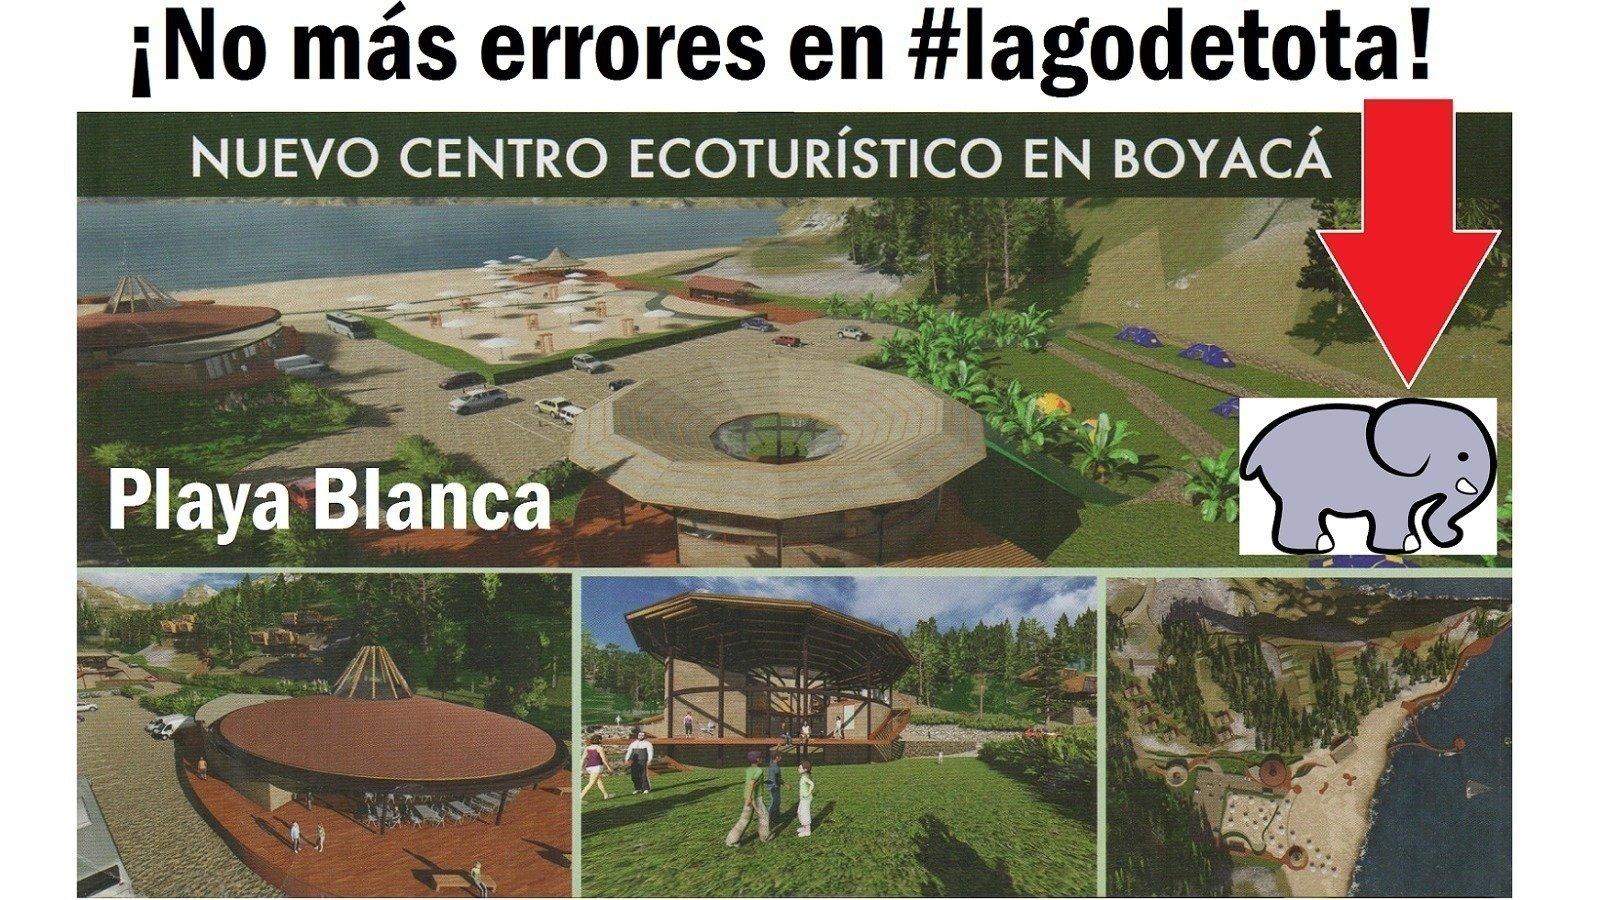 Petici n no m s errores en lagodetota mincomercioco for No mas 900 oficina directa